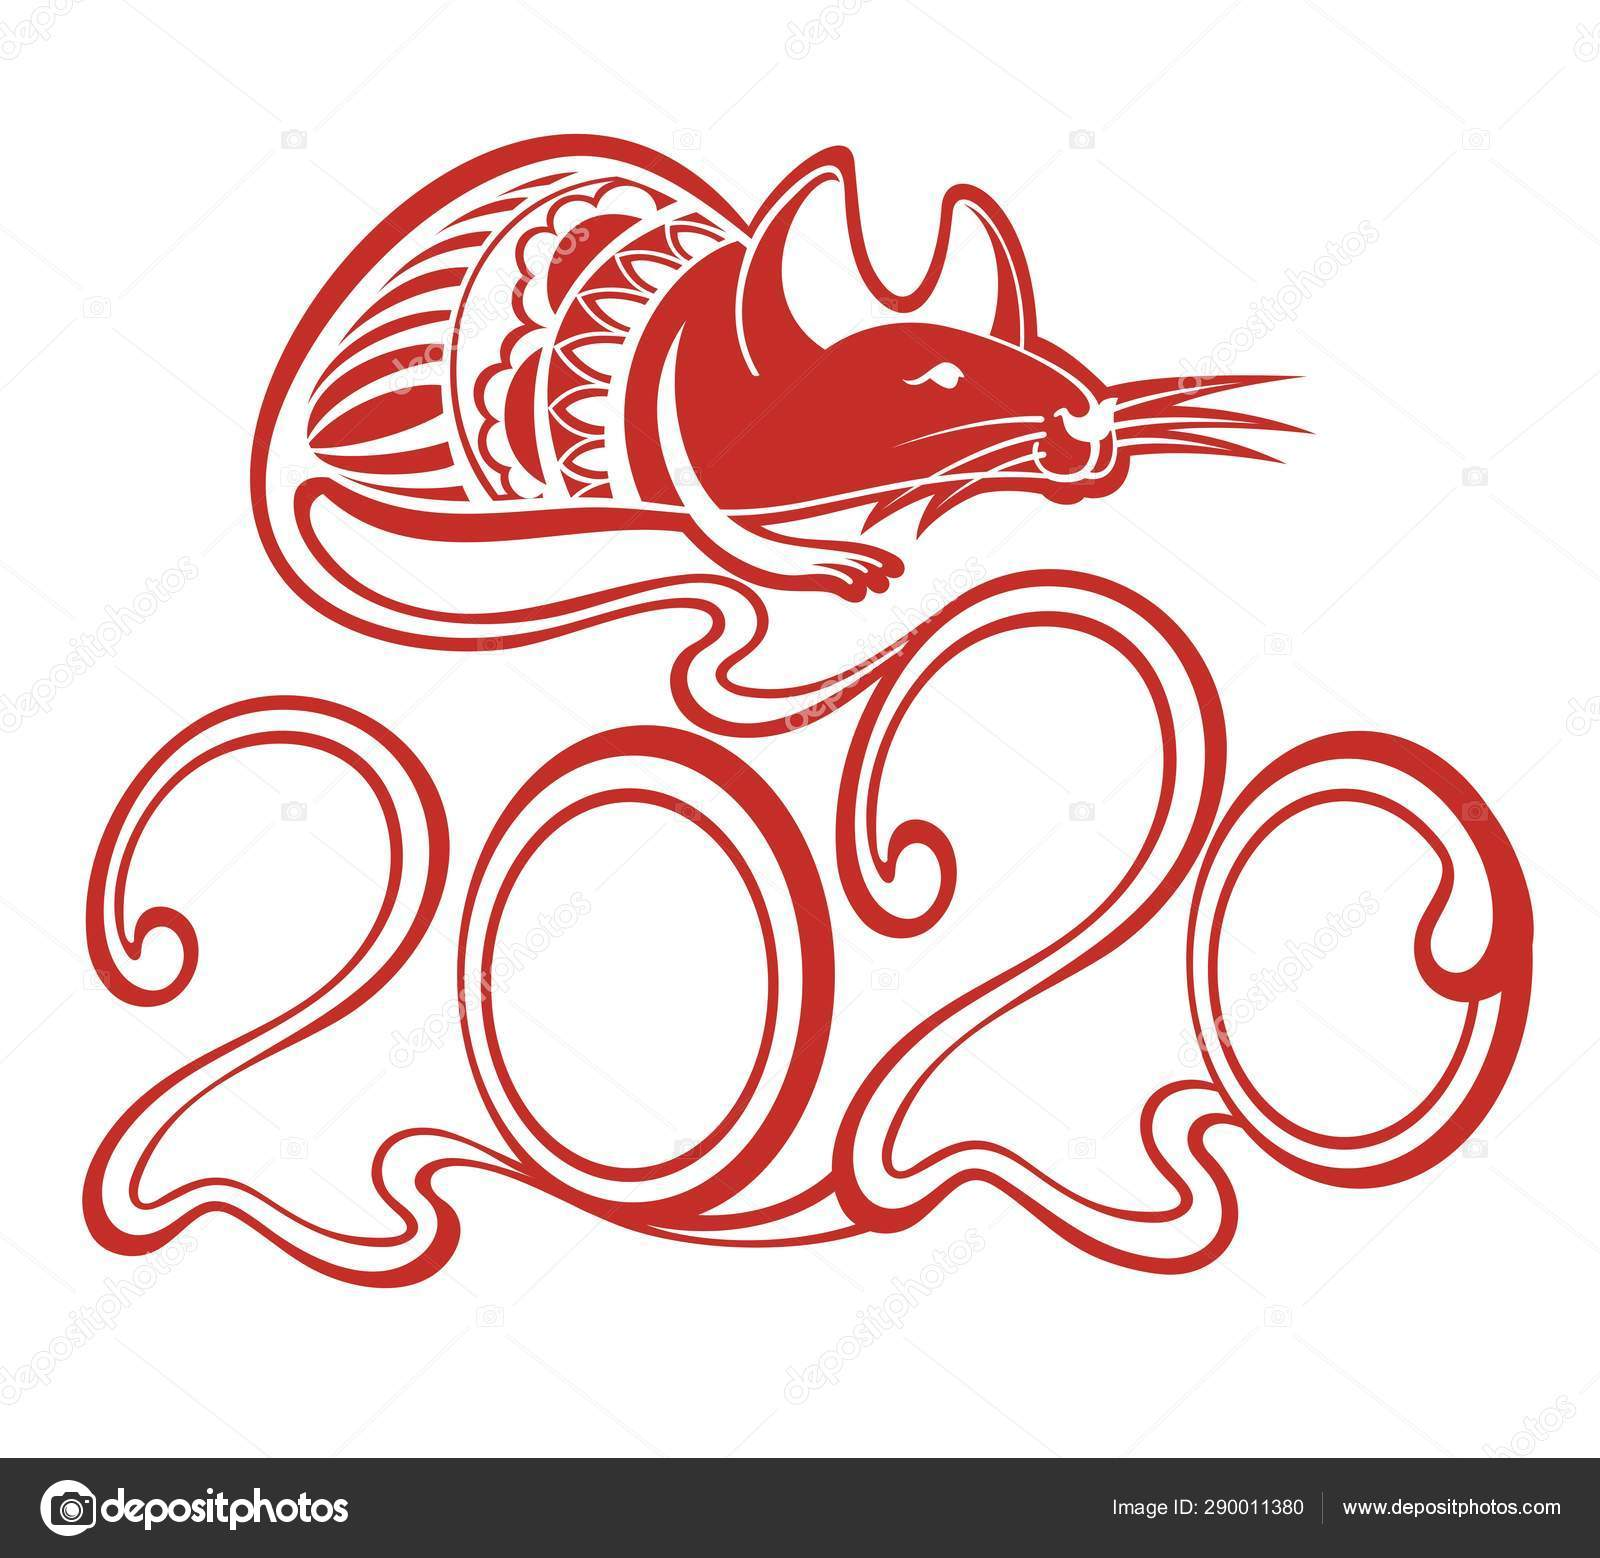 Chinese New Year 2020 Zodiac.Happy Chinese New Year 2020 Year Chinese Zodiac Sign Year